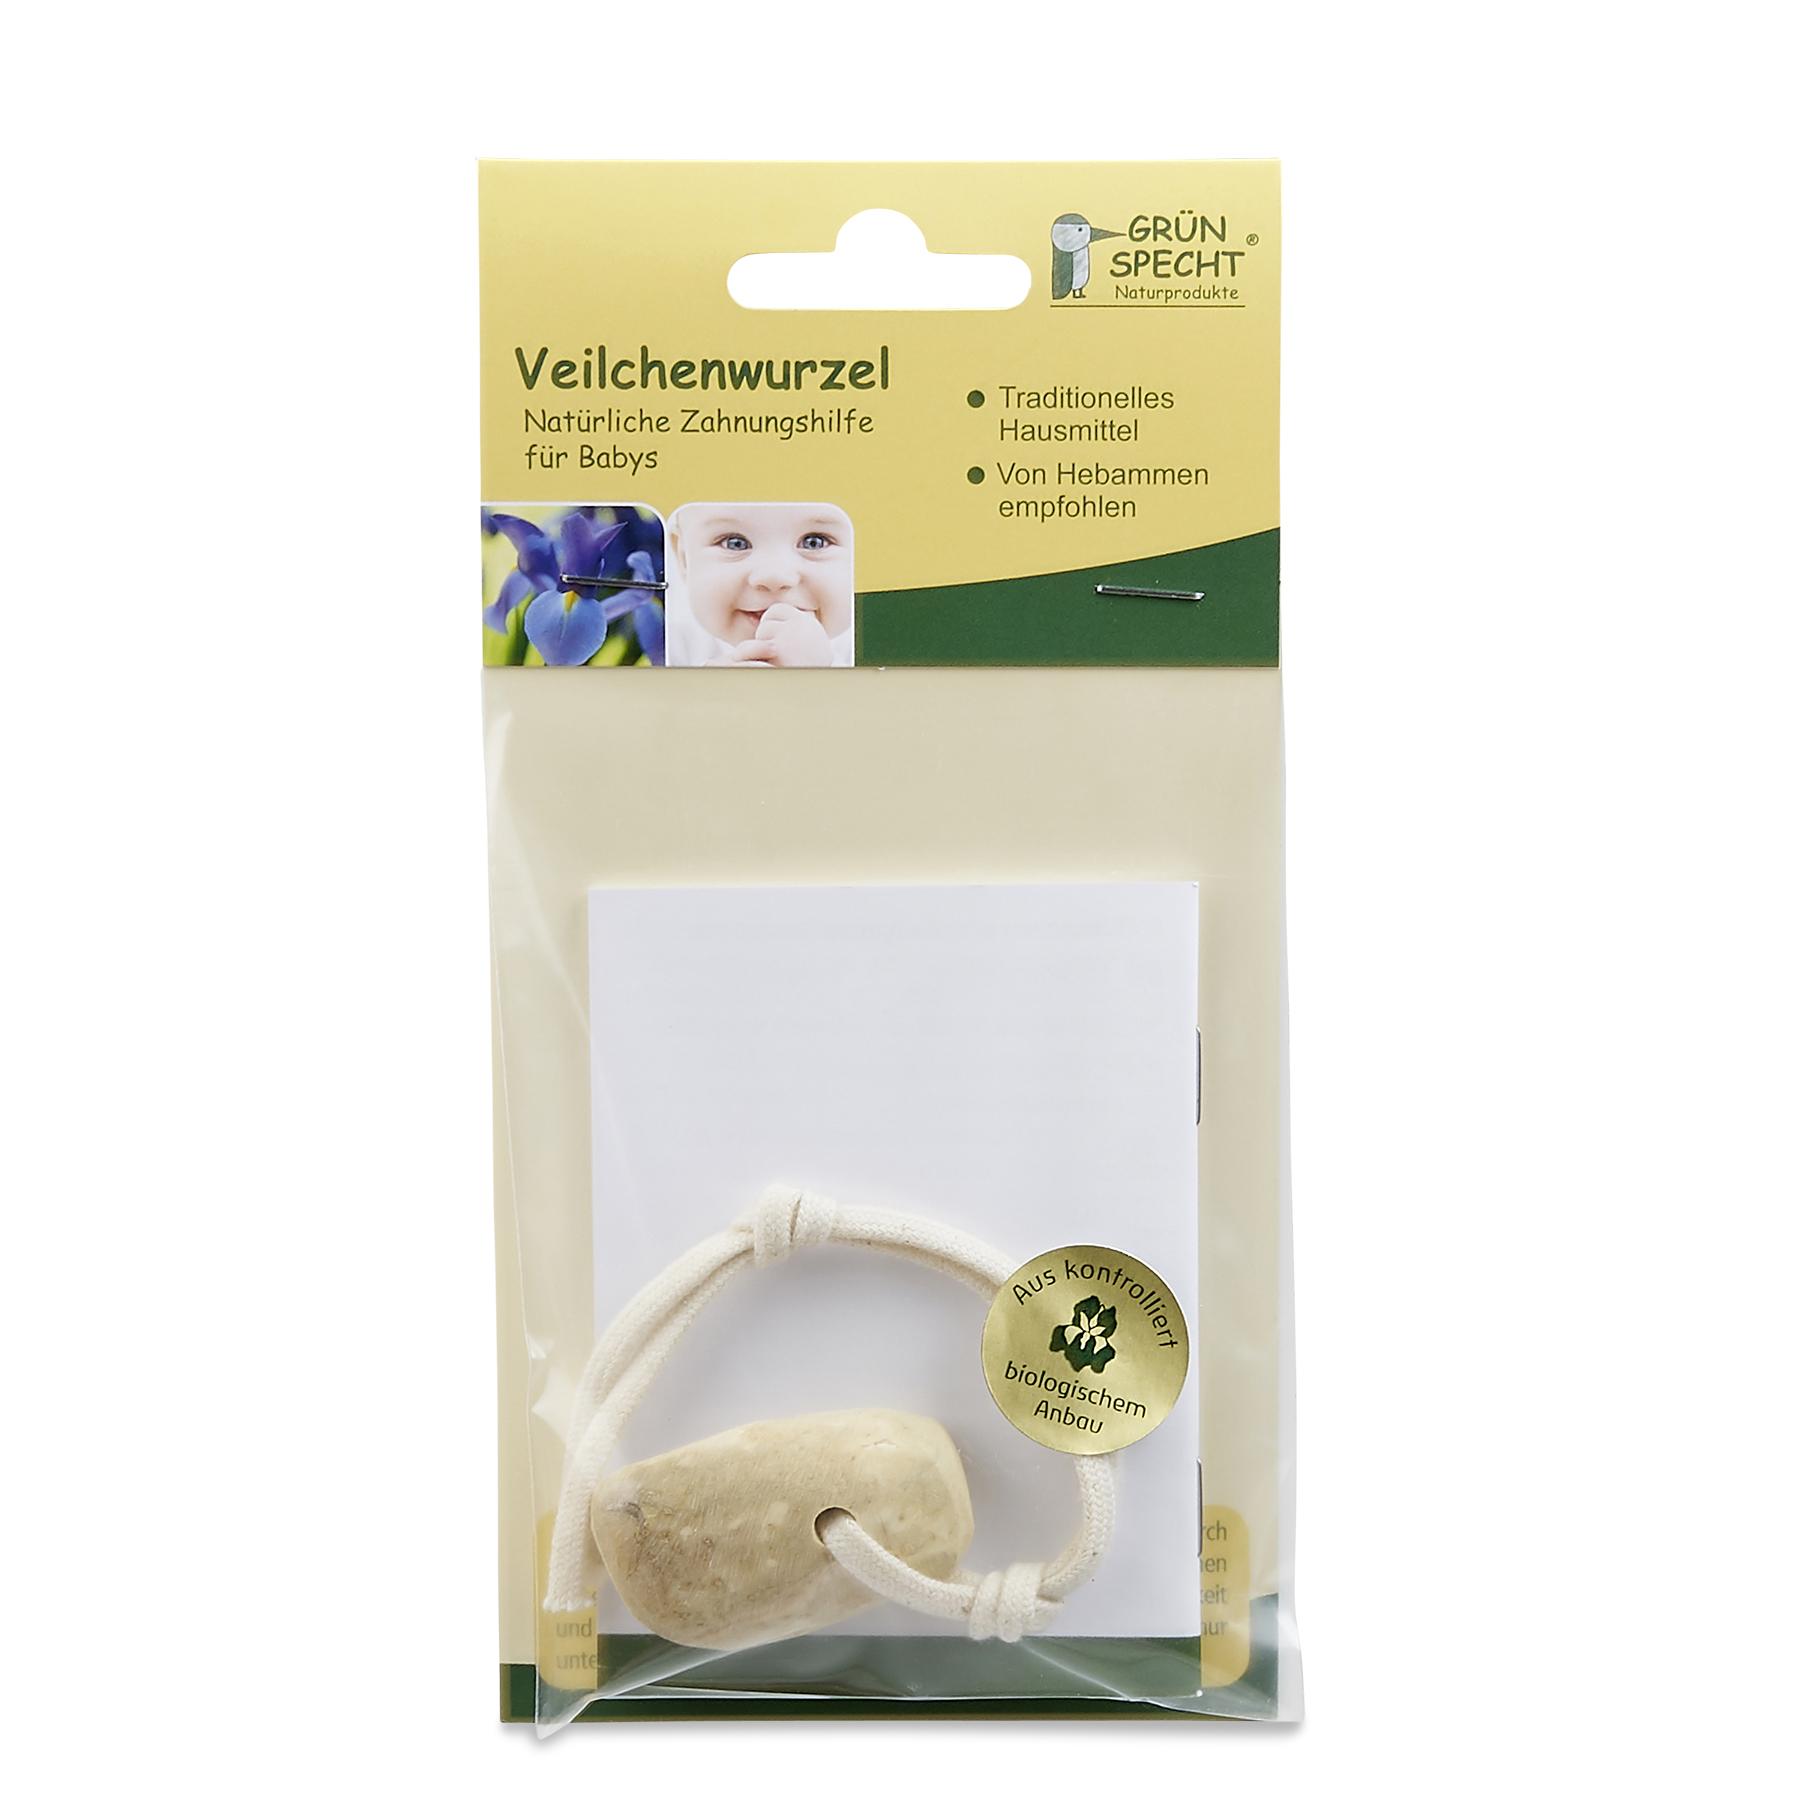 Gr/ünspecht 532-V1 Bio-Veilchenwurzel an Kordel